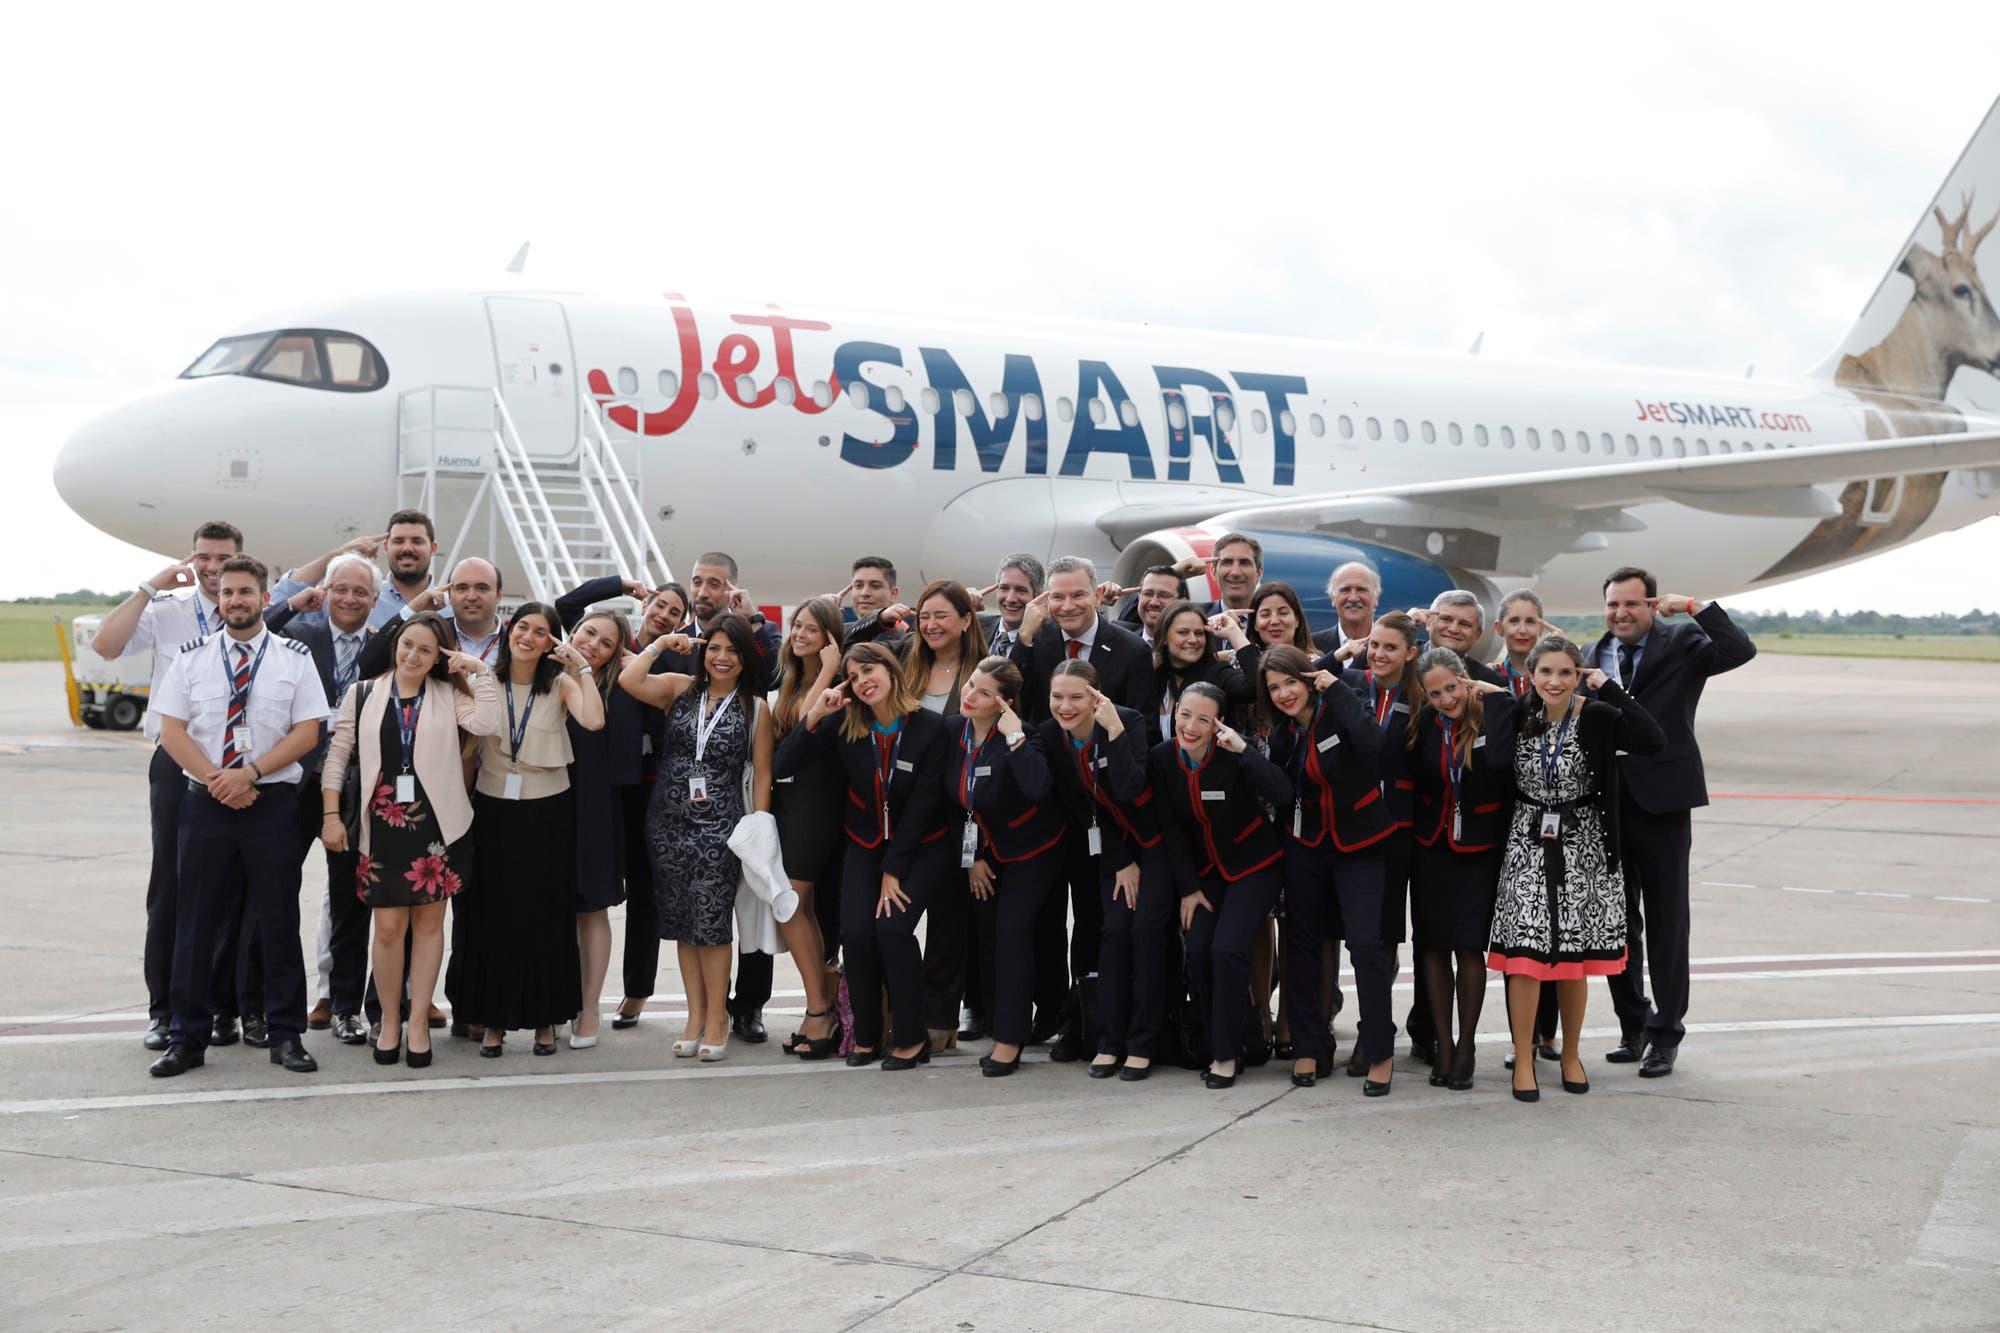 Resultado de imagen para Jetsmart Argentina huemul